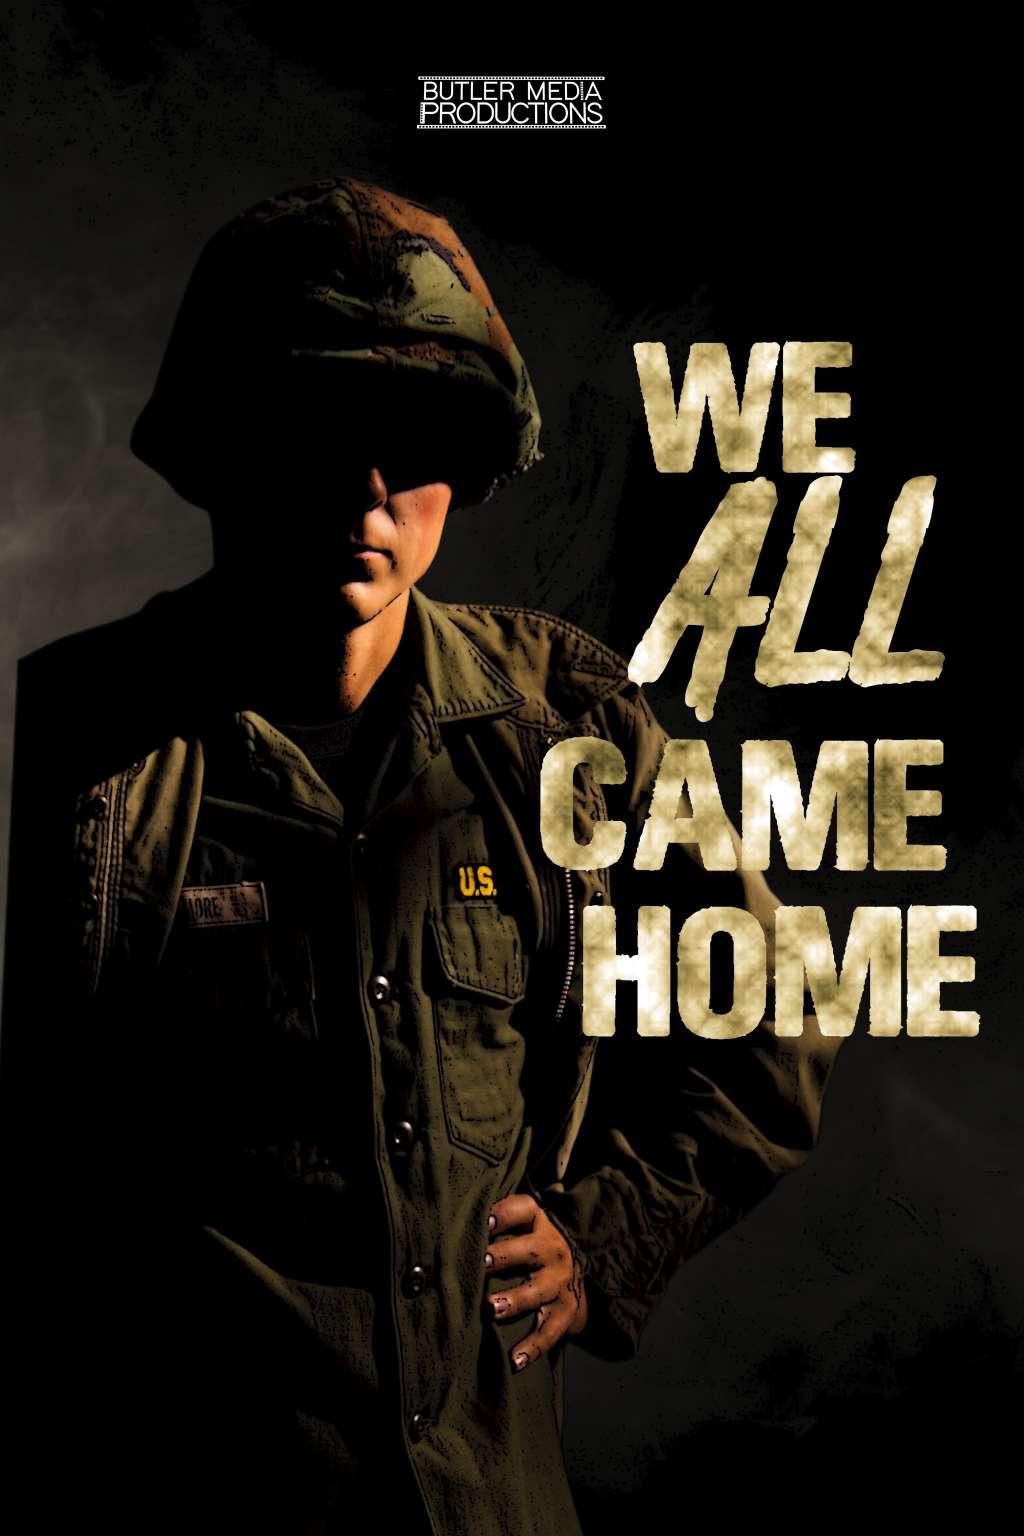 We All Came Home kapak